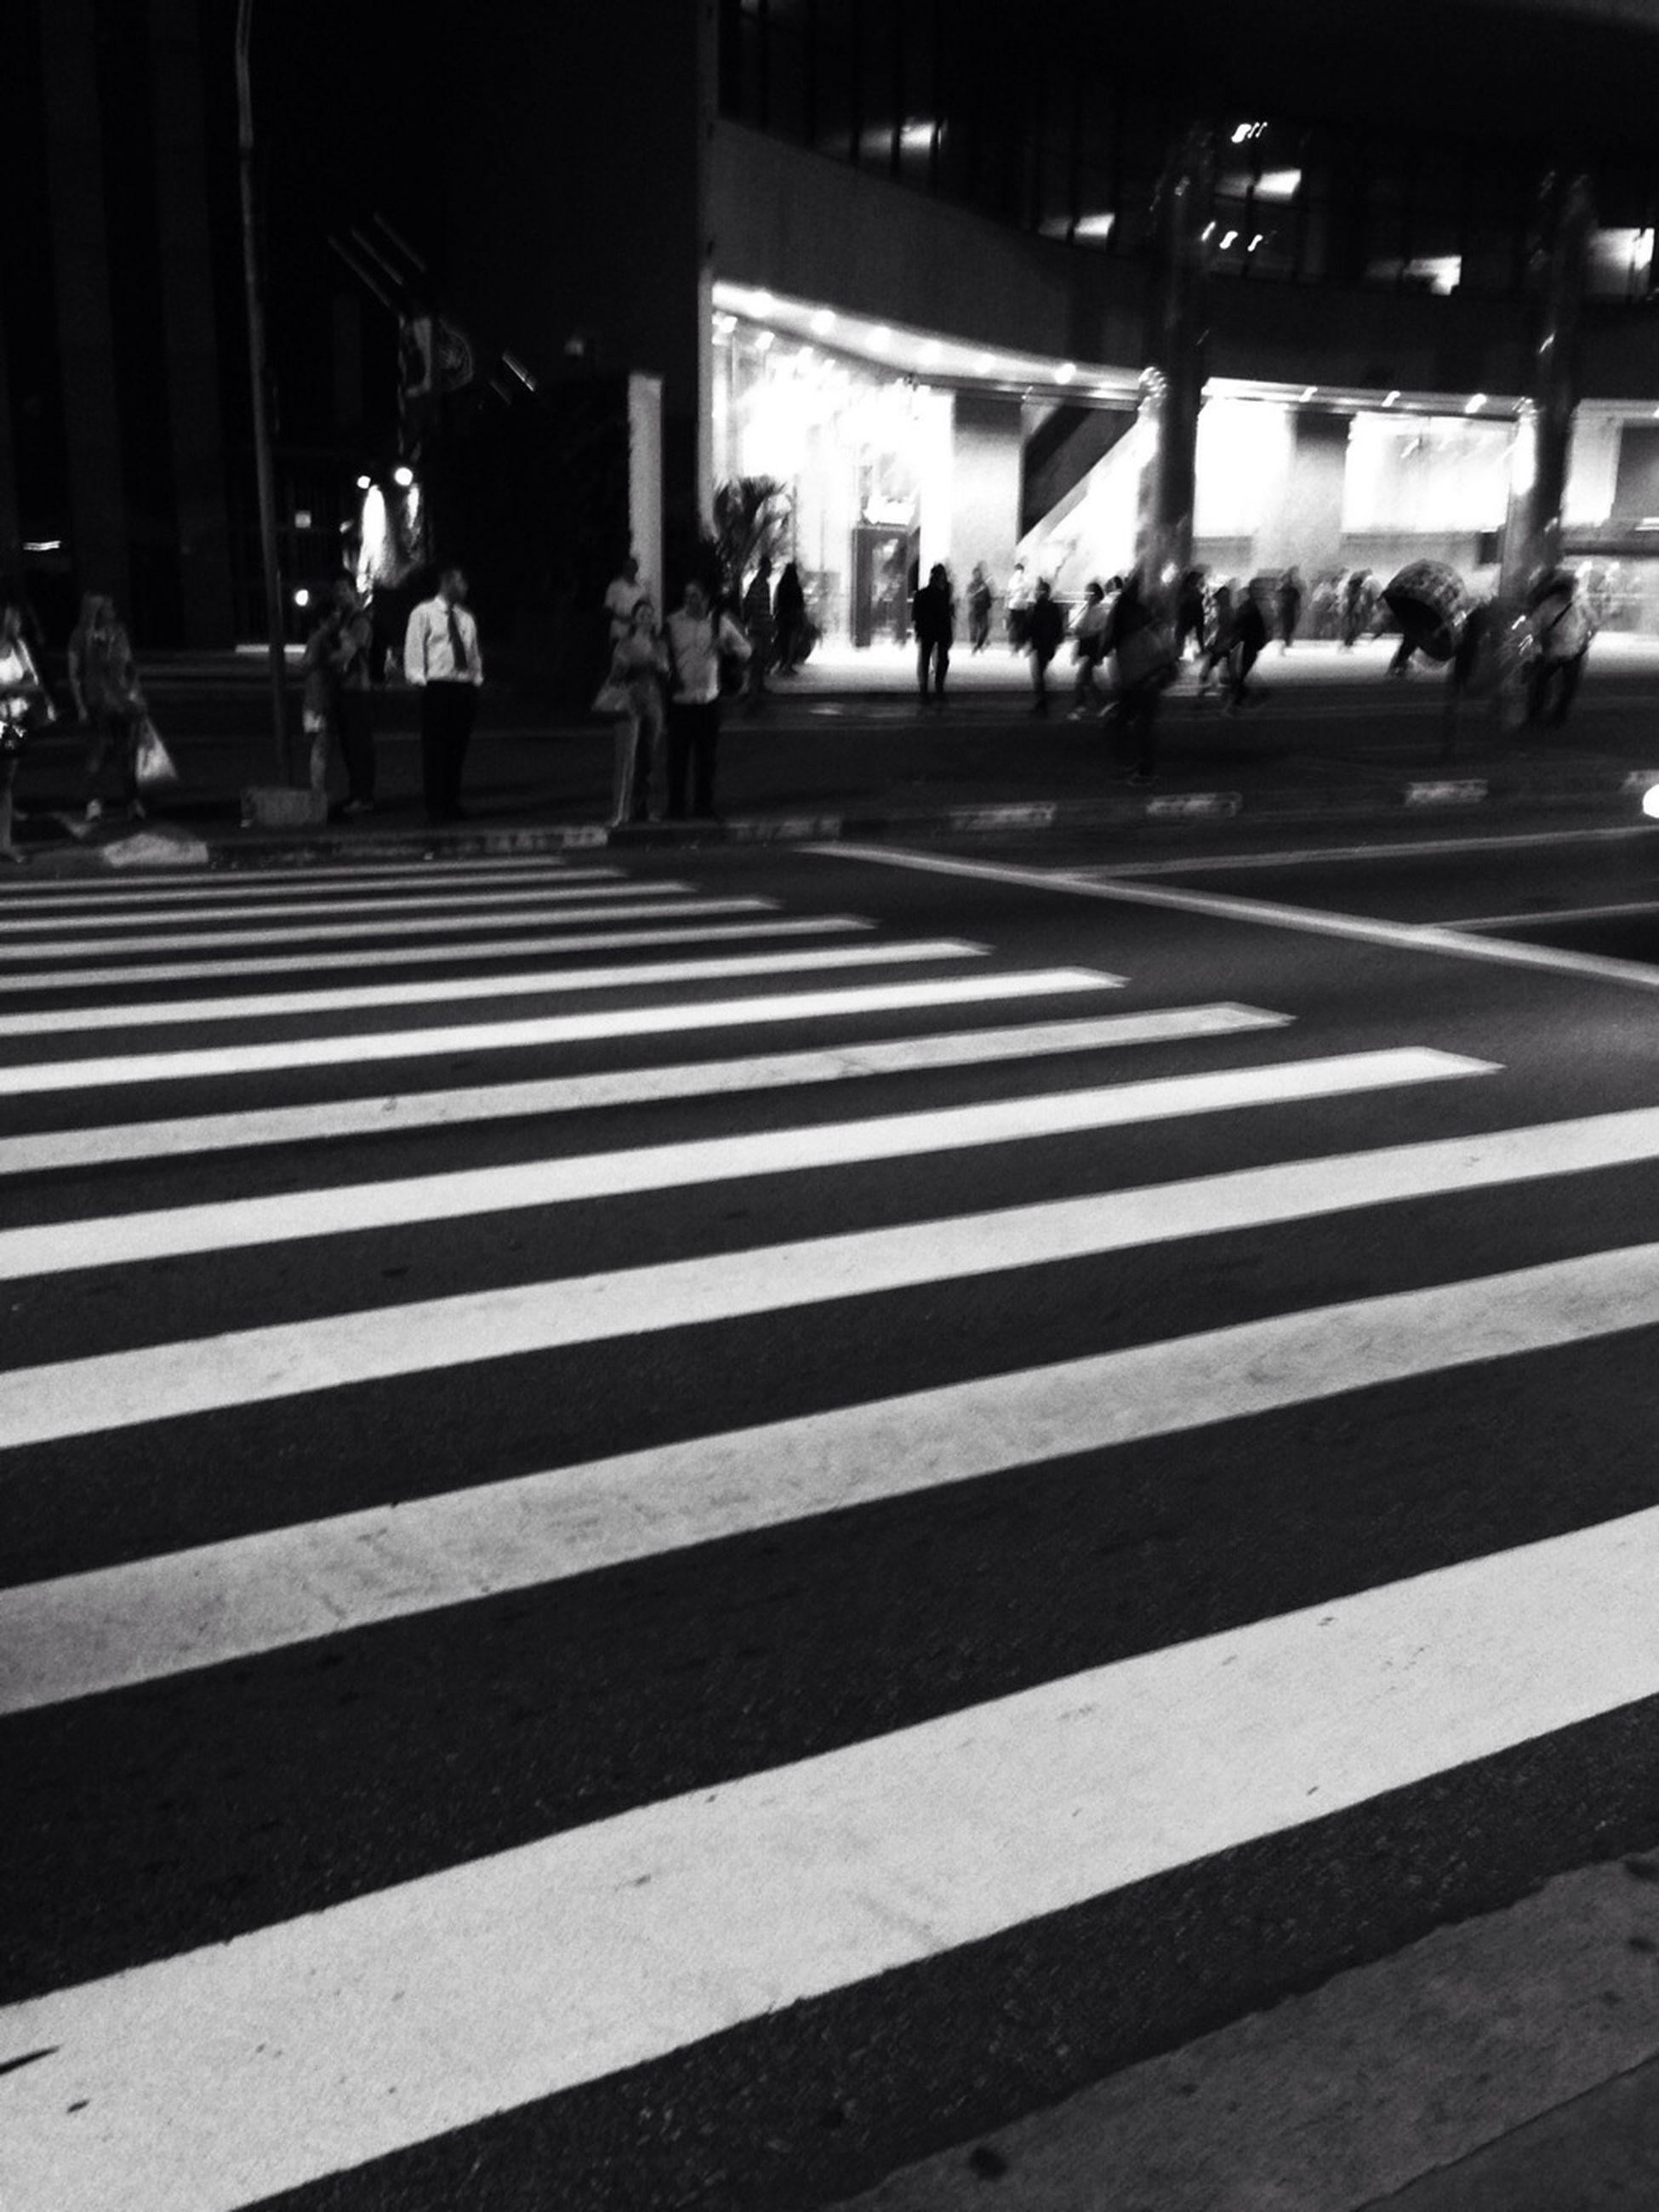 street, road marking, transportation, zebra crossing, city, city life, road, city street, men, person, walking, lifestyles, large group of people, car, land vehicle, building exterior, mode of transport, incidental people, asphalt